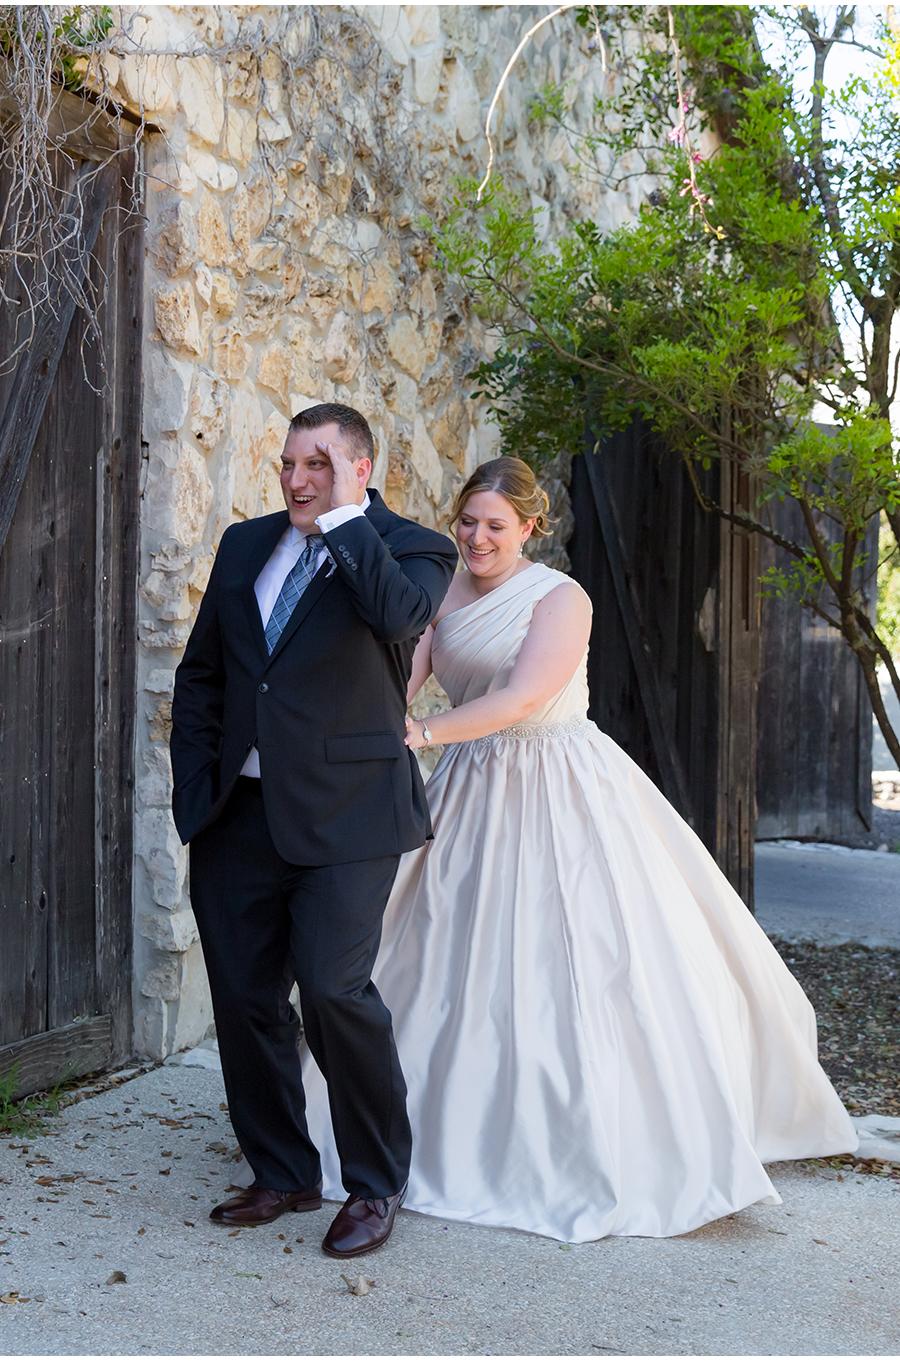 0Stokes-Wedding-017.jpg